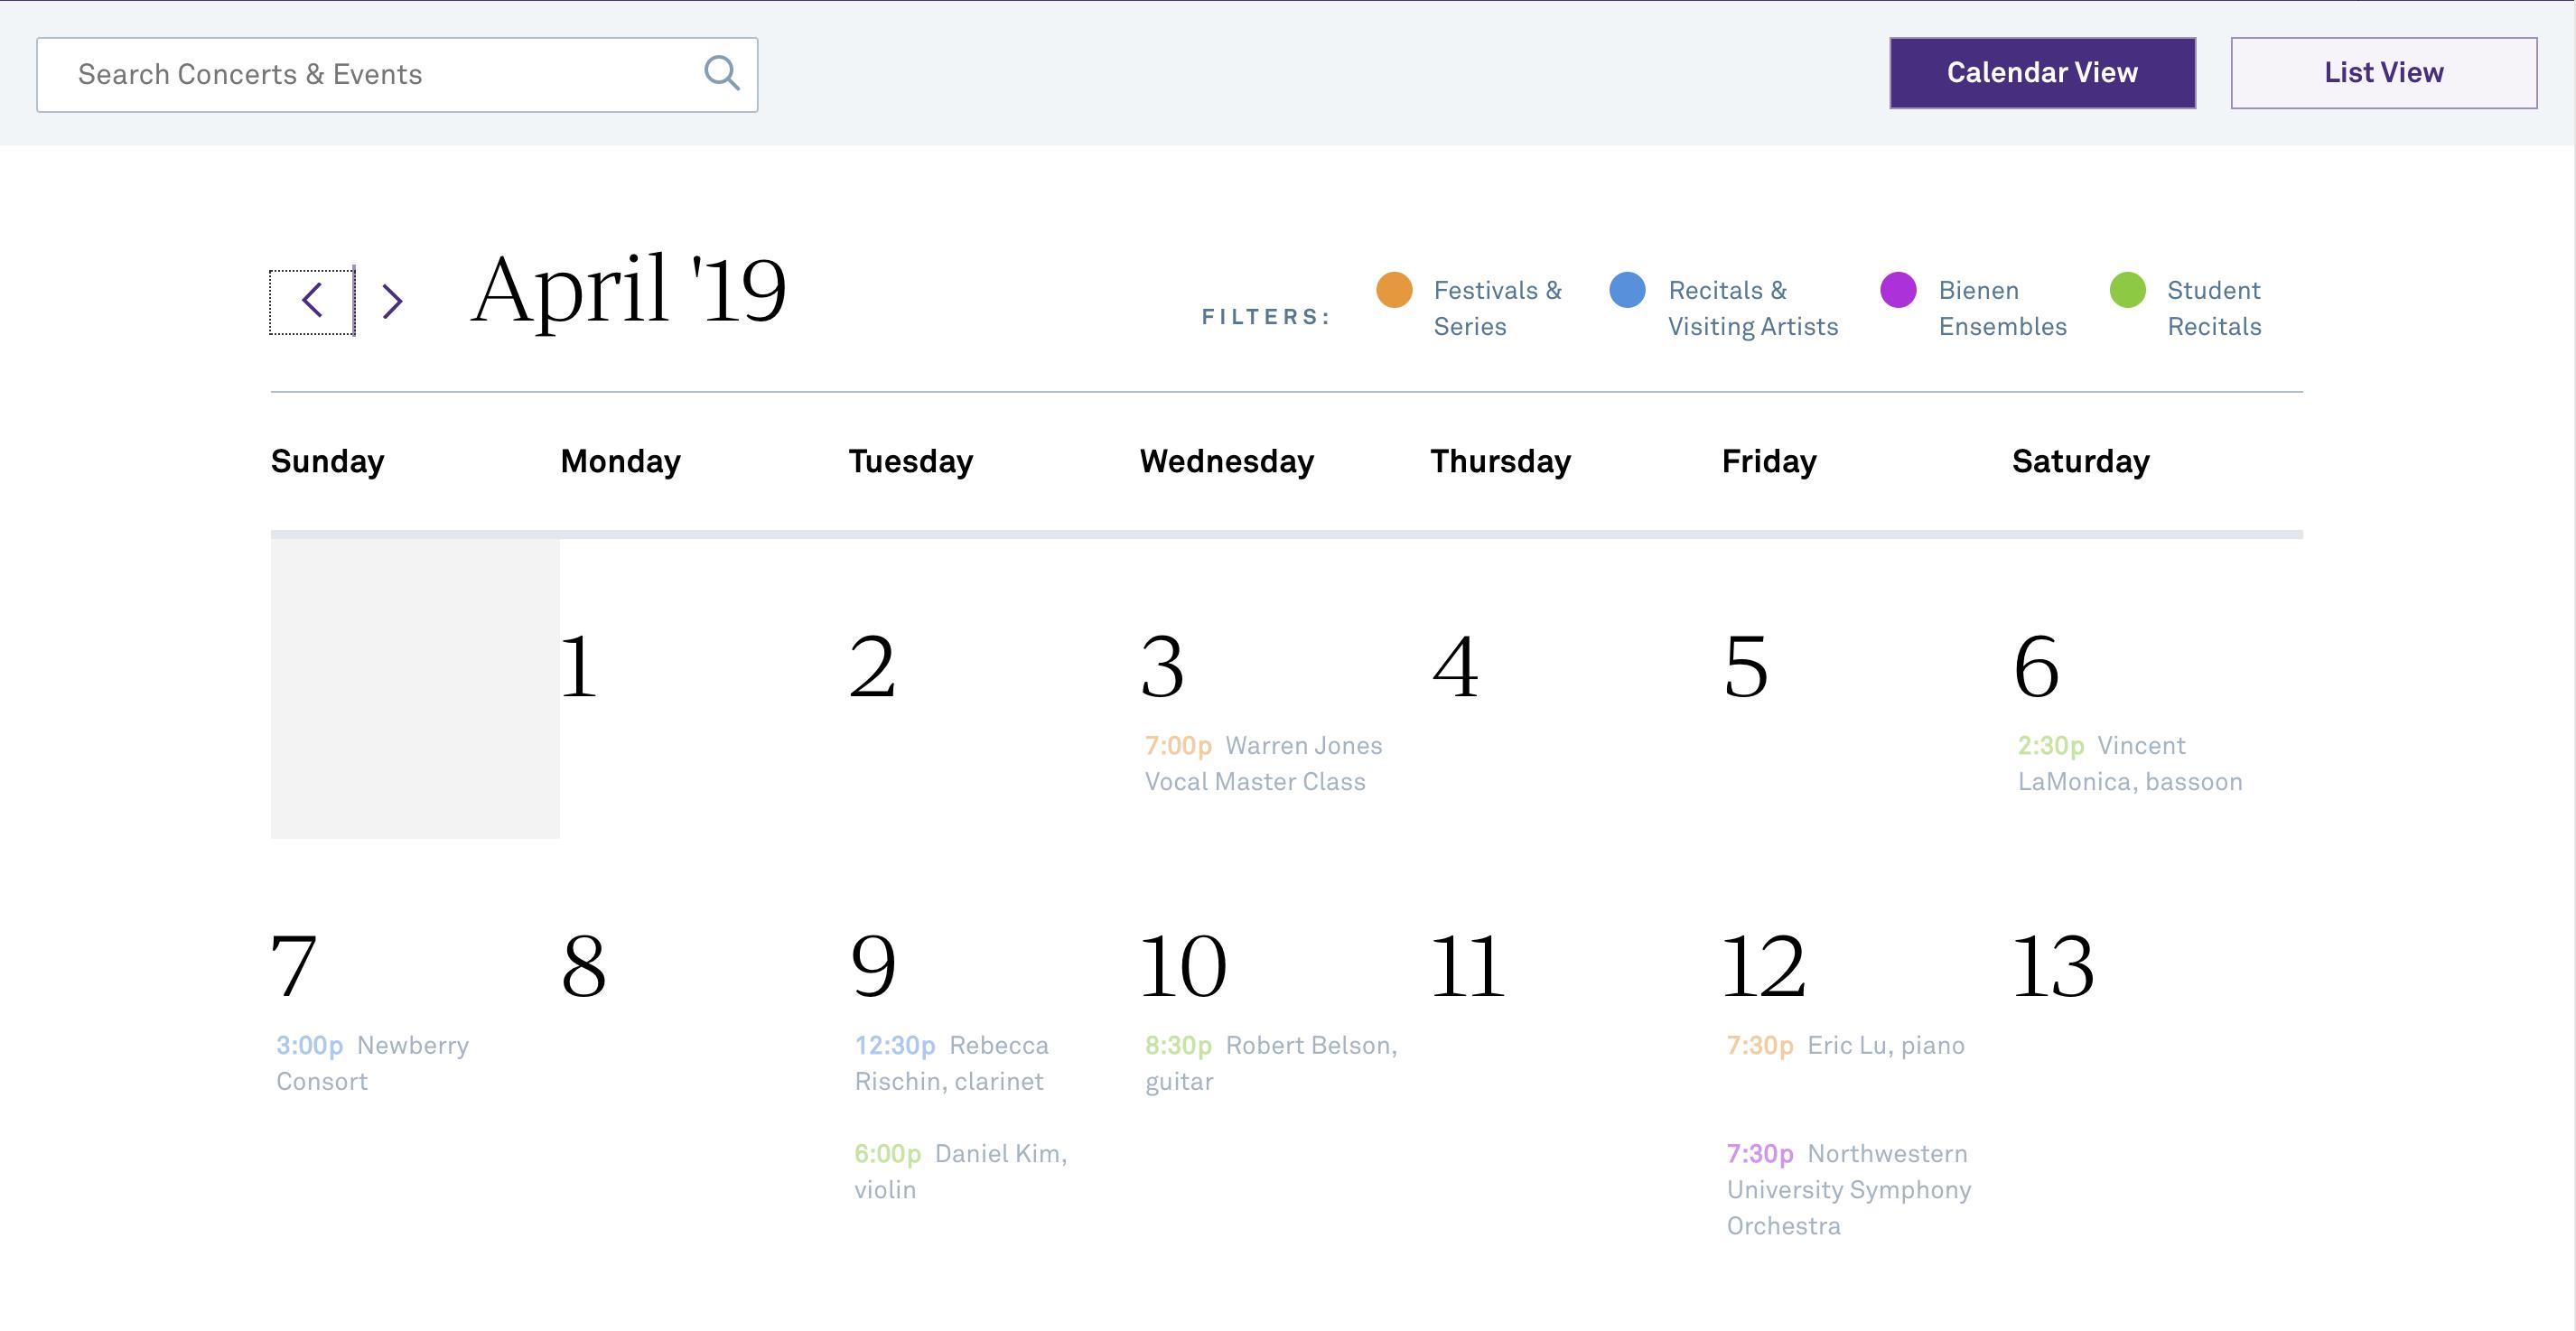 April 2019 view of the calendar